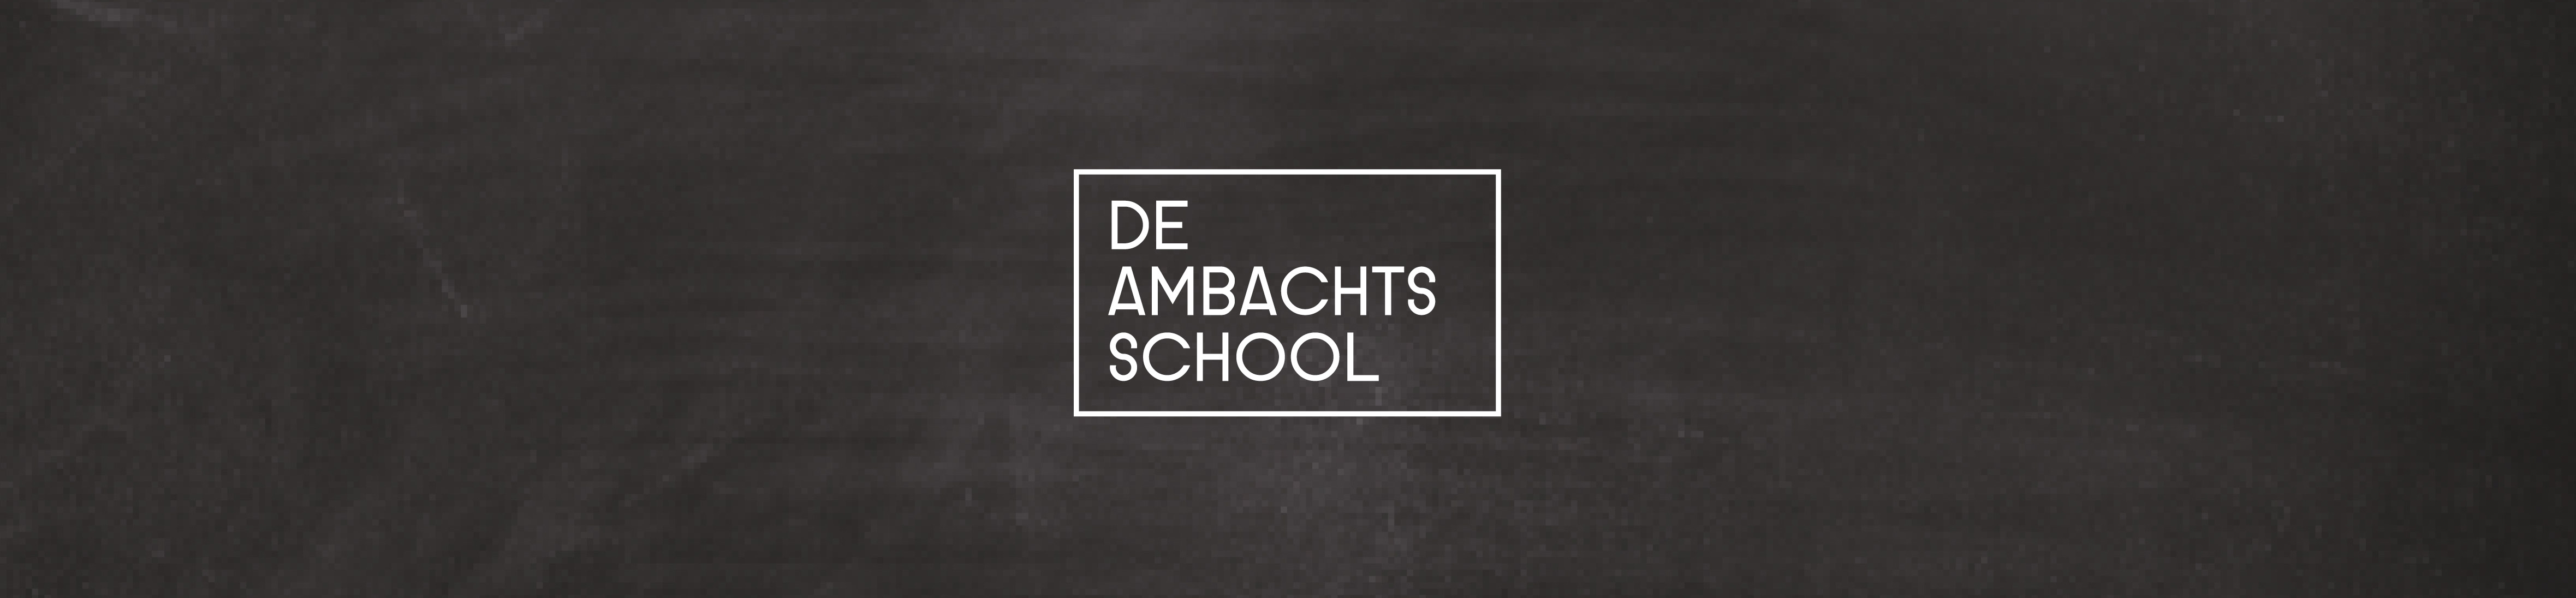 header_ambachtsschool